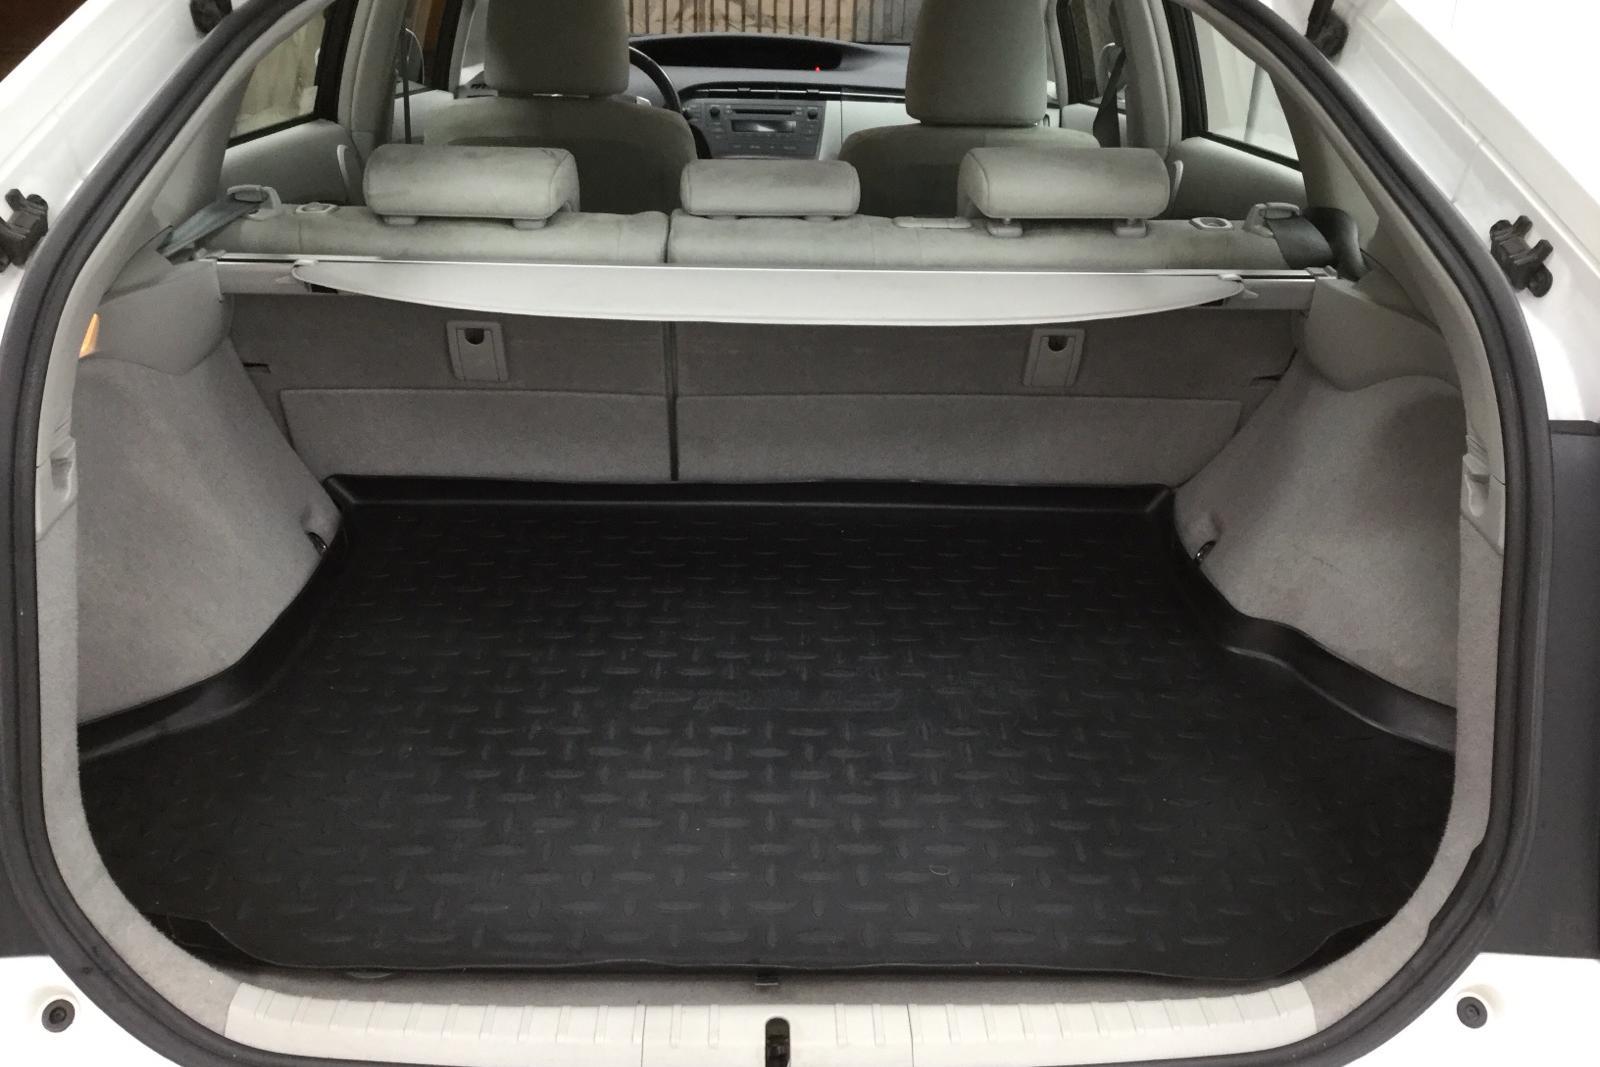 Toyota Prius 1.8 Hybrid (99hk) - 9 000 mil - Automat - vit - 2009